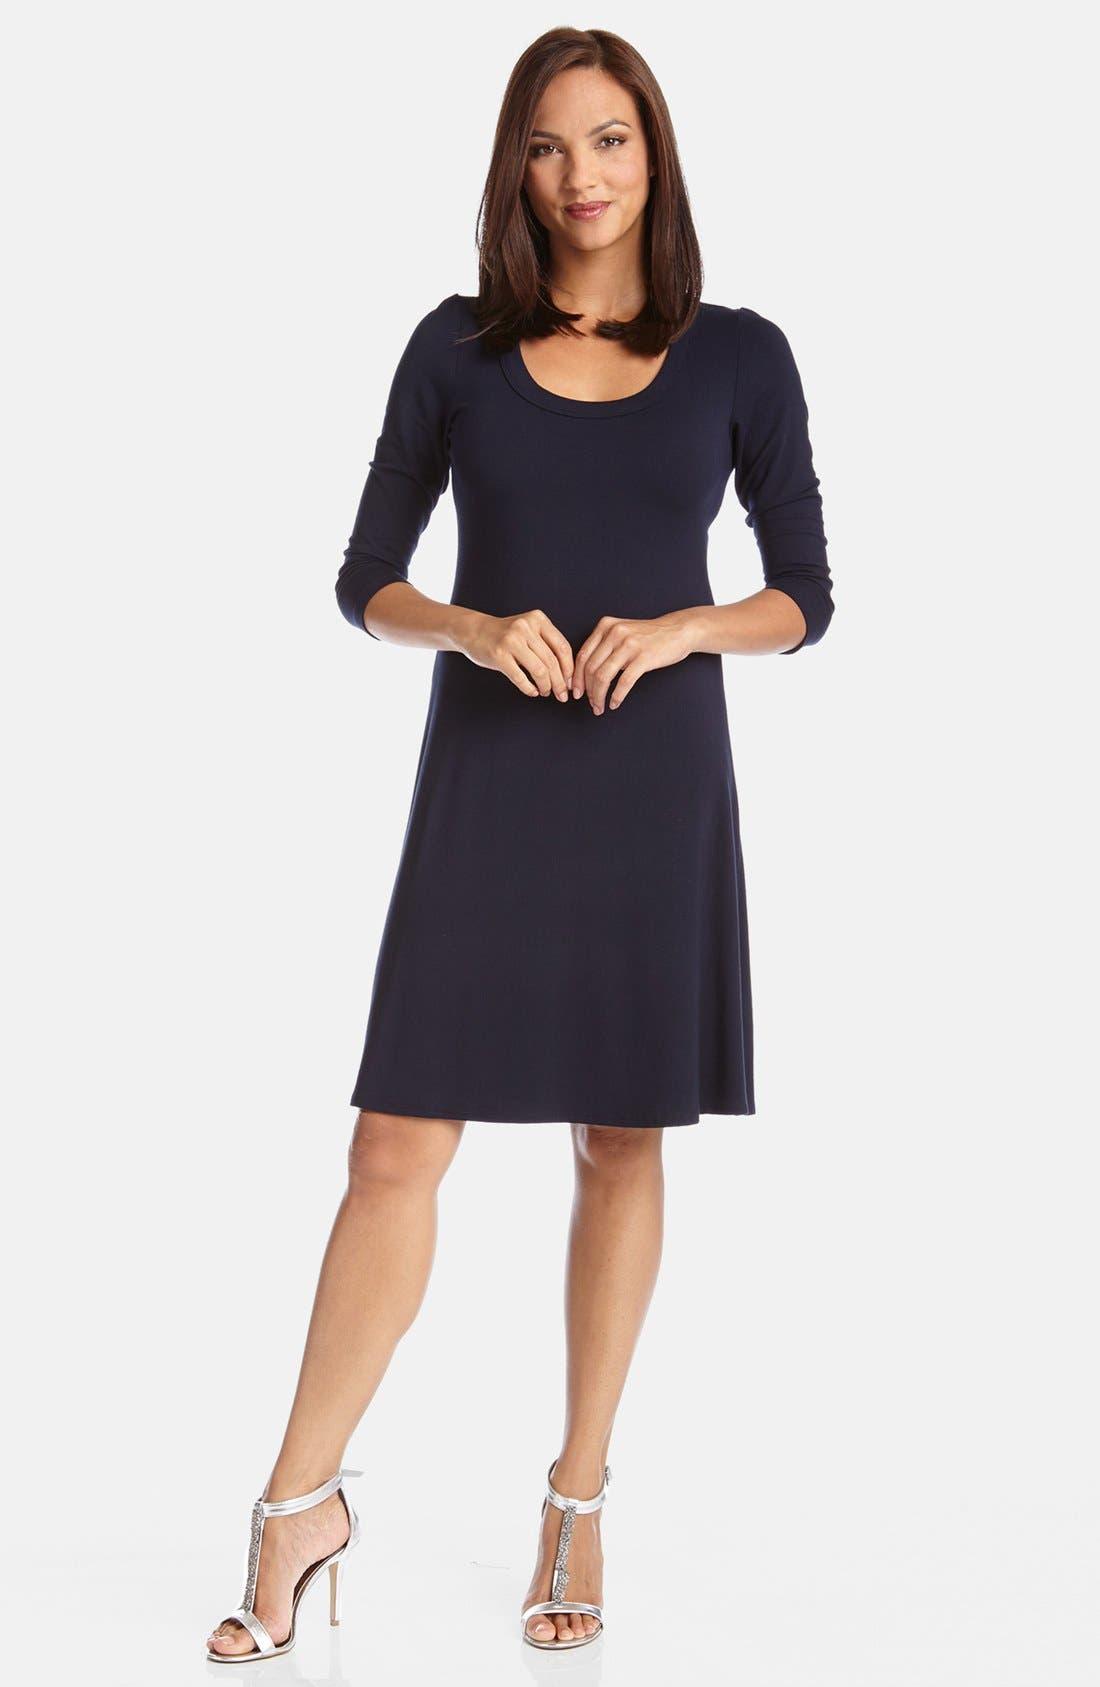 KAREN KANE A-Line Jersey Dress, Main, color, NAVY